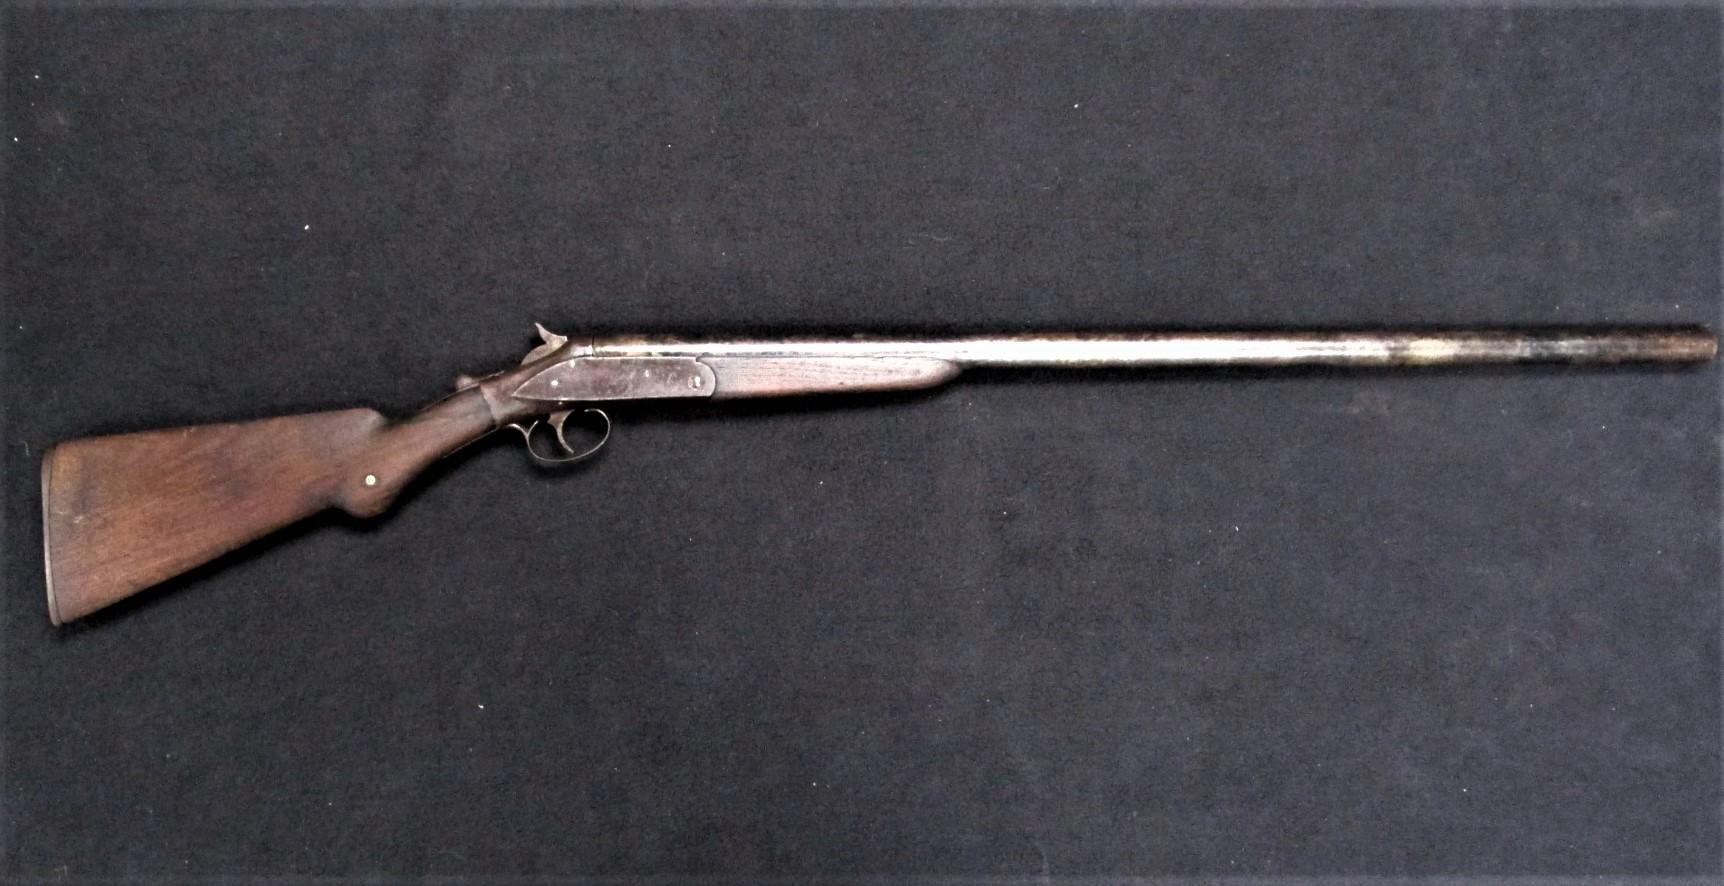 Forehand Arms Co. - Shotgun